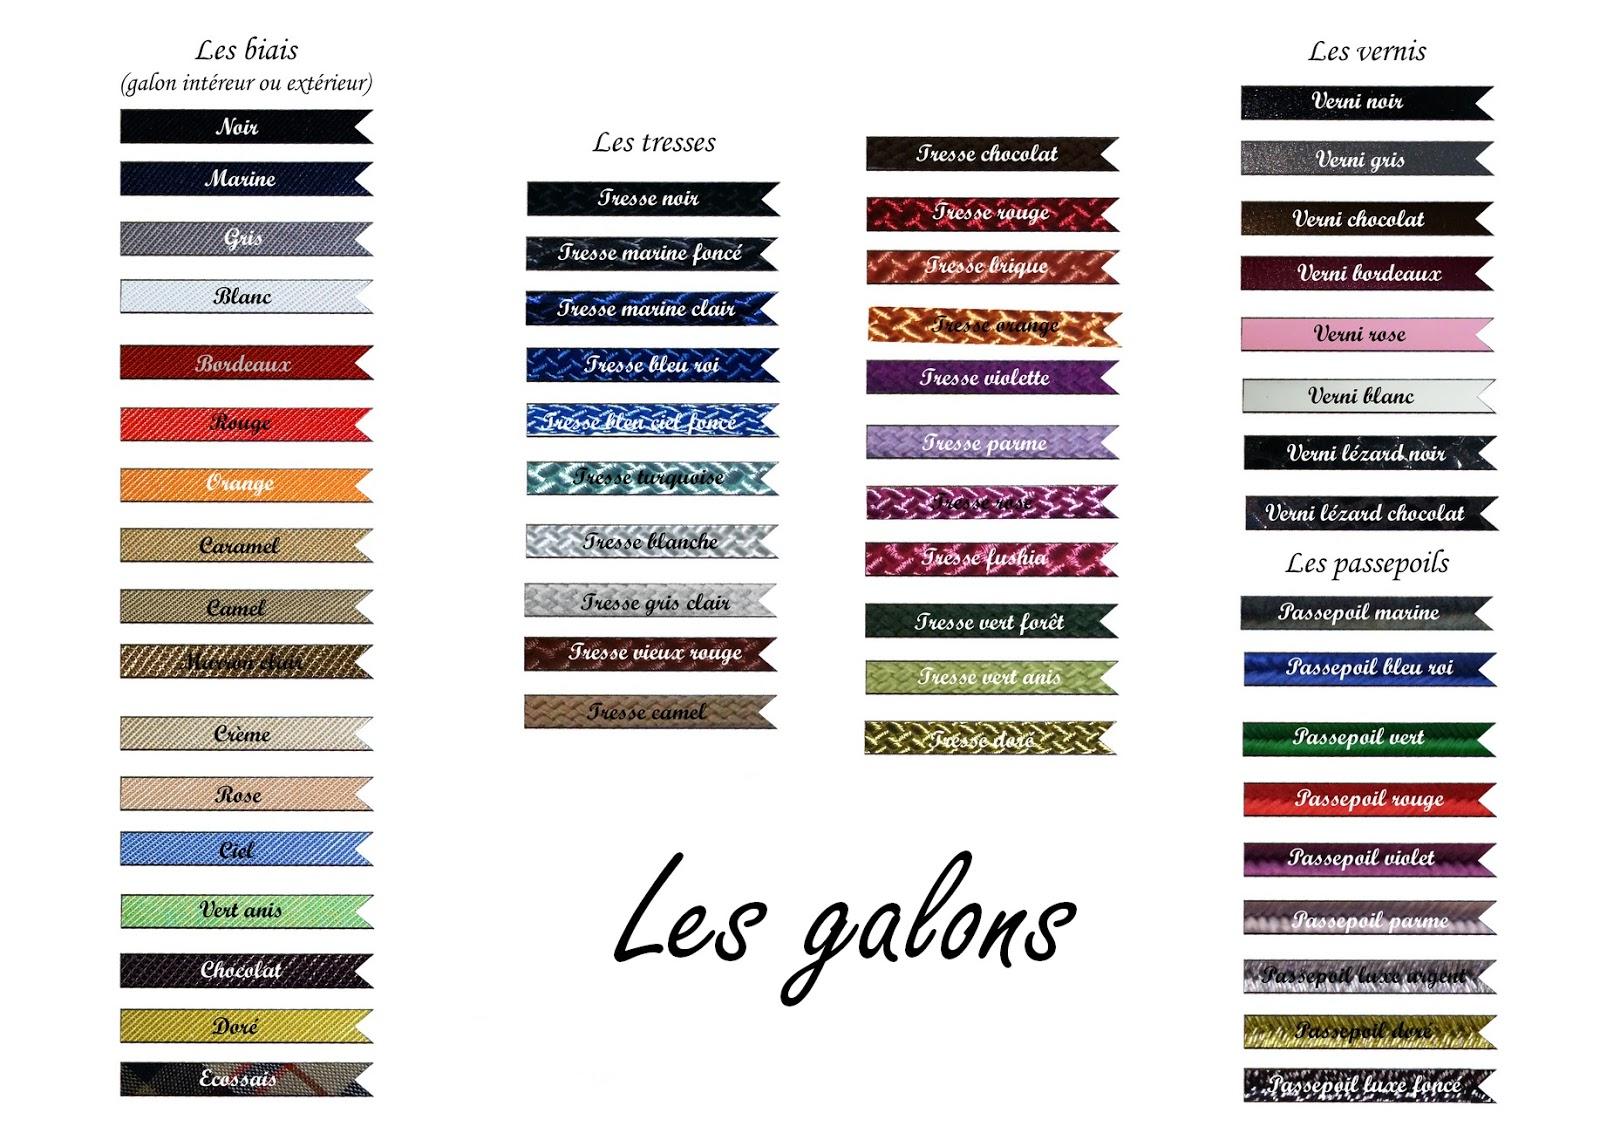 Carrelage Design tapis paddock personnalisable : Paddock Sports - Personnalisez vos tapis : u265e Carnet du0026#39;une Cavaliu00e8re ...